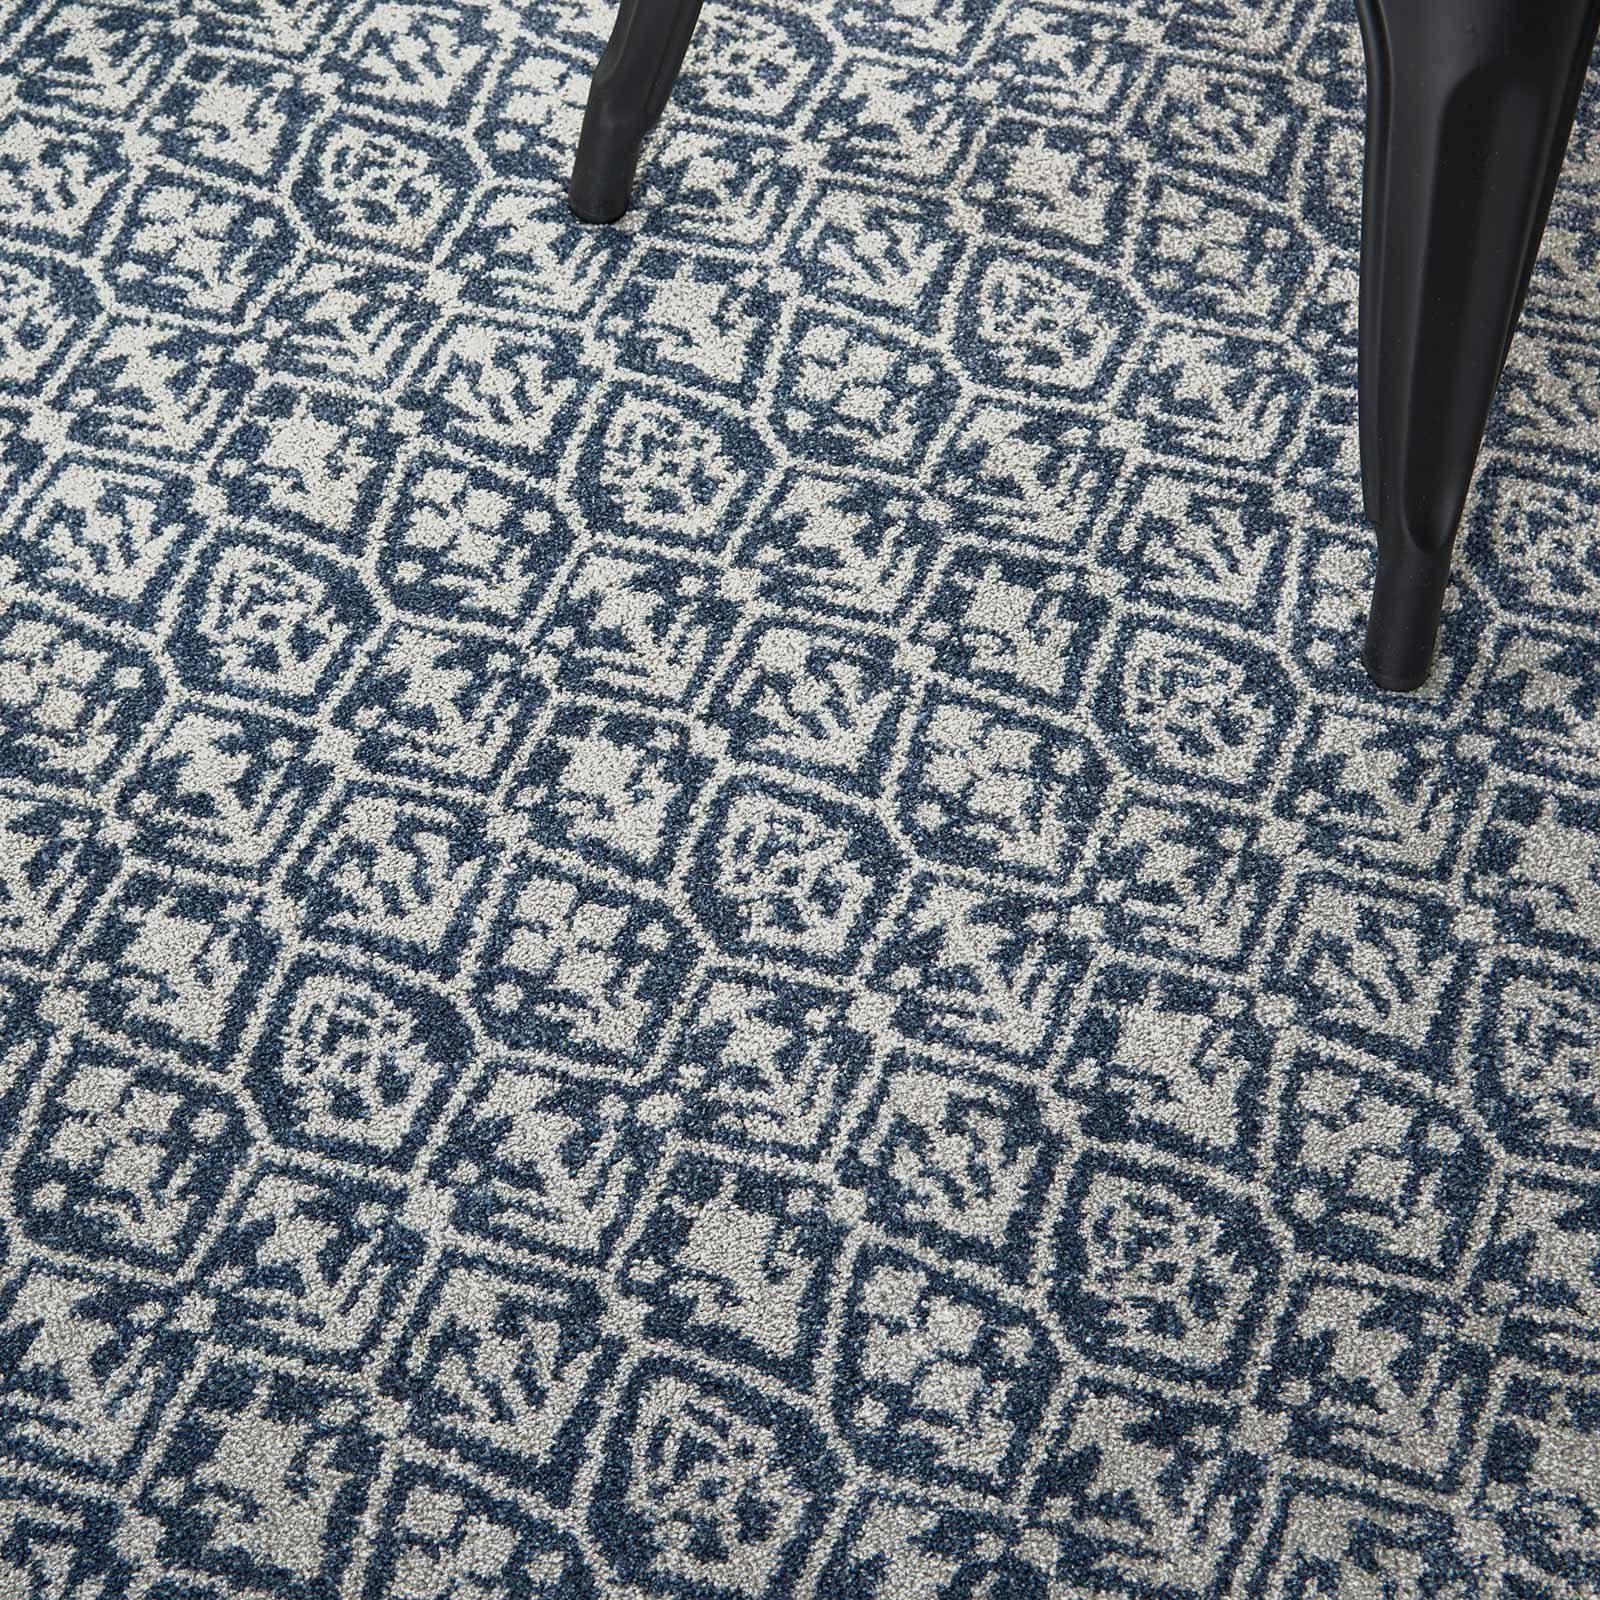 Nourison rug Palermo PMR01 BLUE GREY 5X7 099446719669 interior 2 C